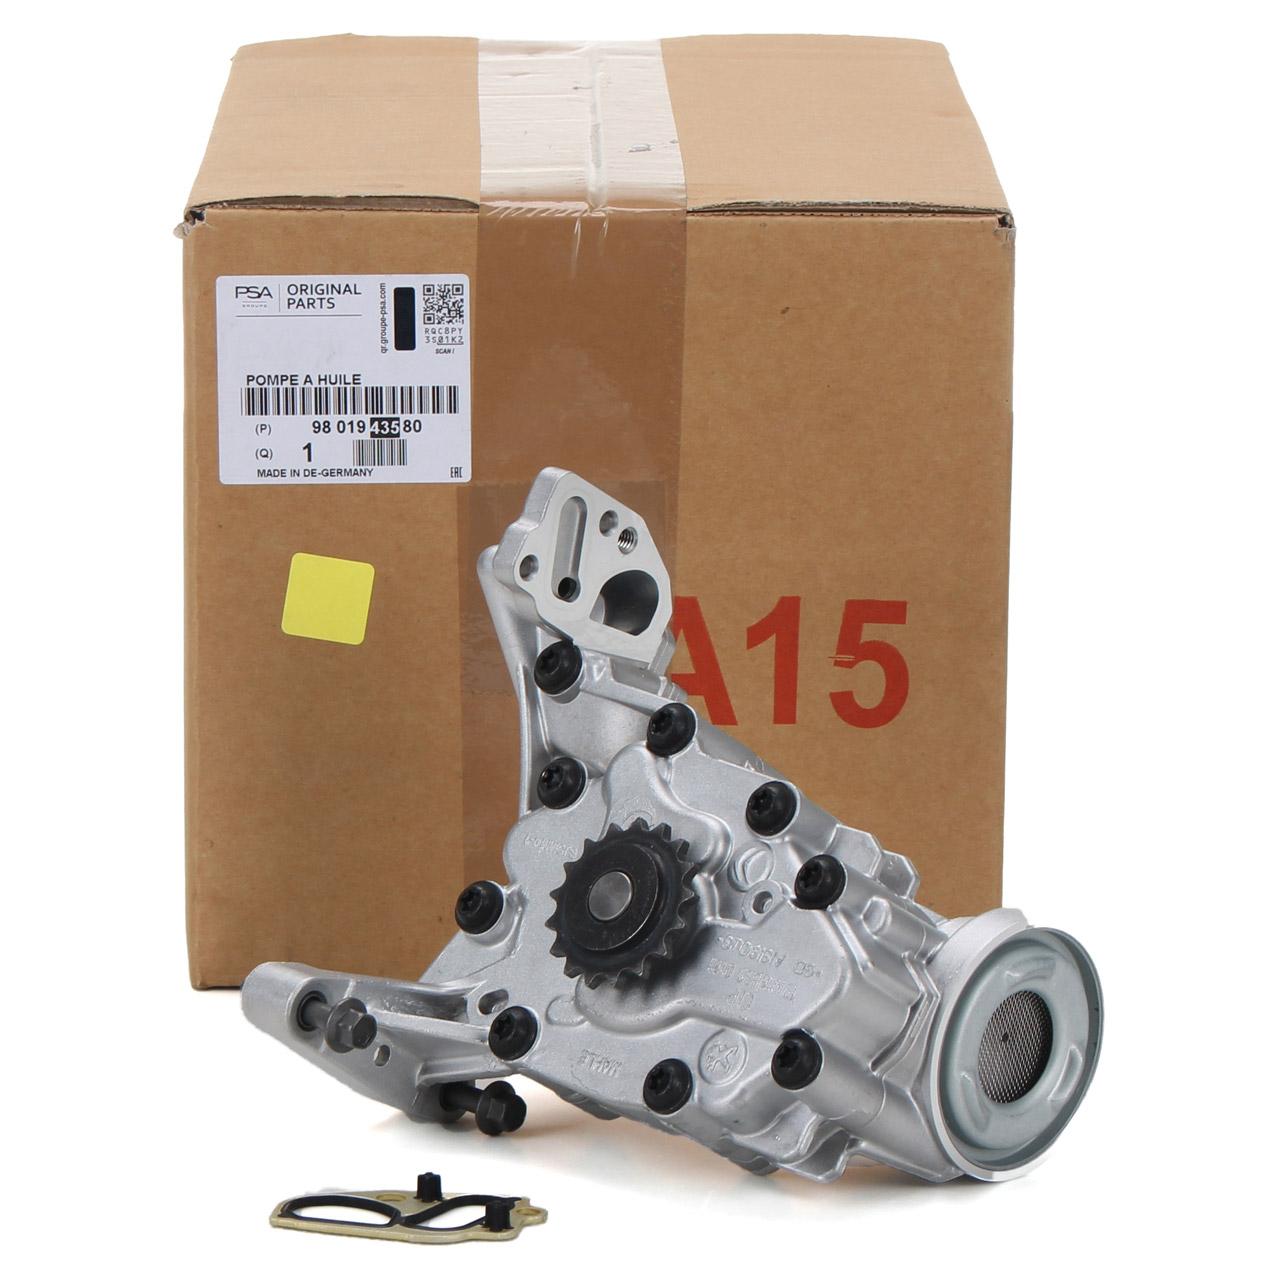 ORIGINAL PSA Ölpumpe Berlingo C3 C4 208 308 Partner Rifter 1.2 THP 9837408880